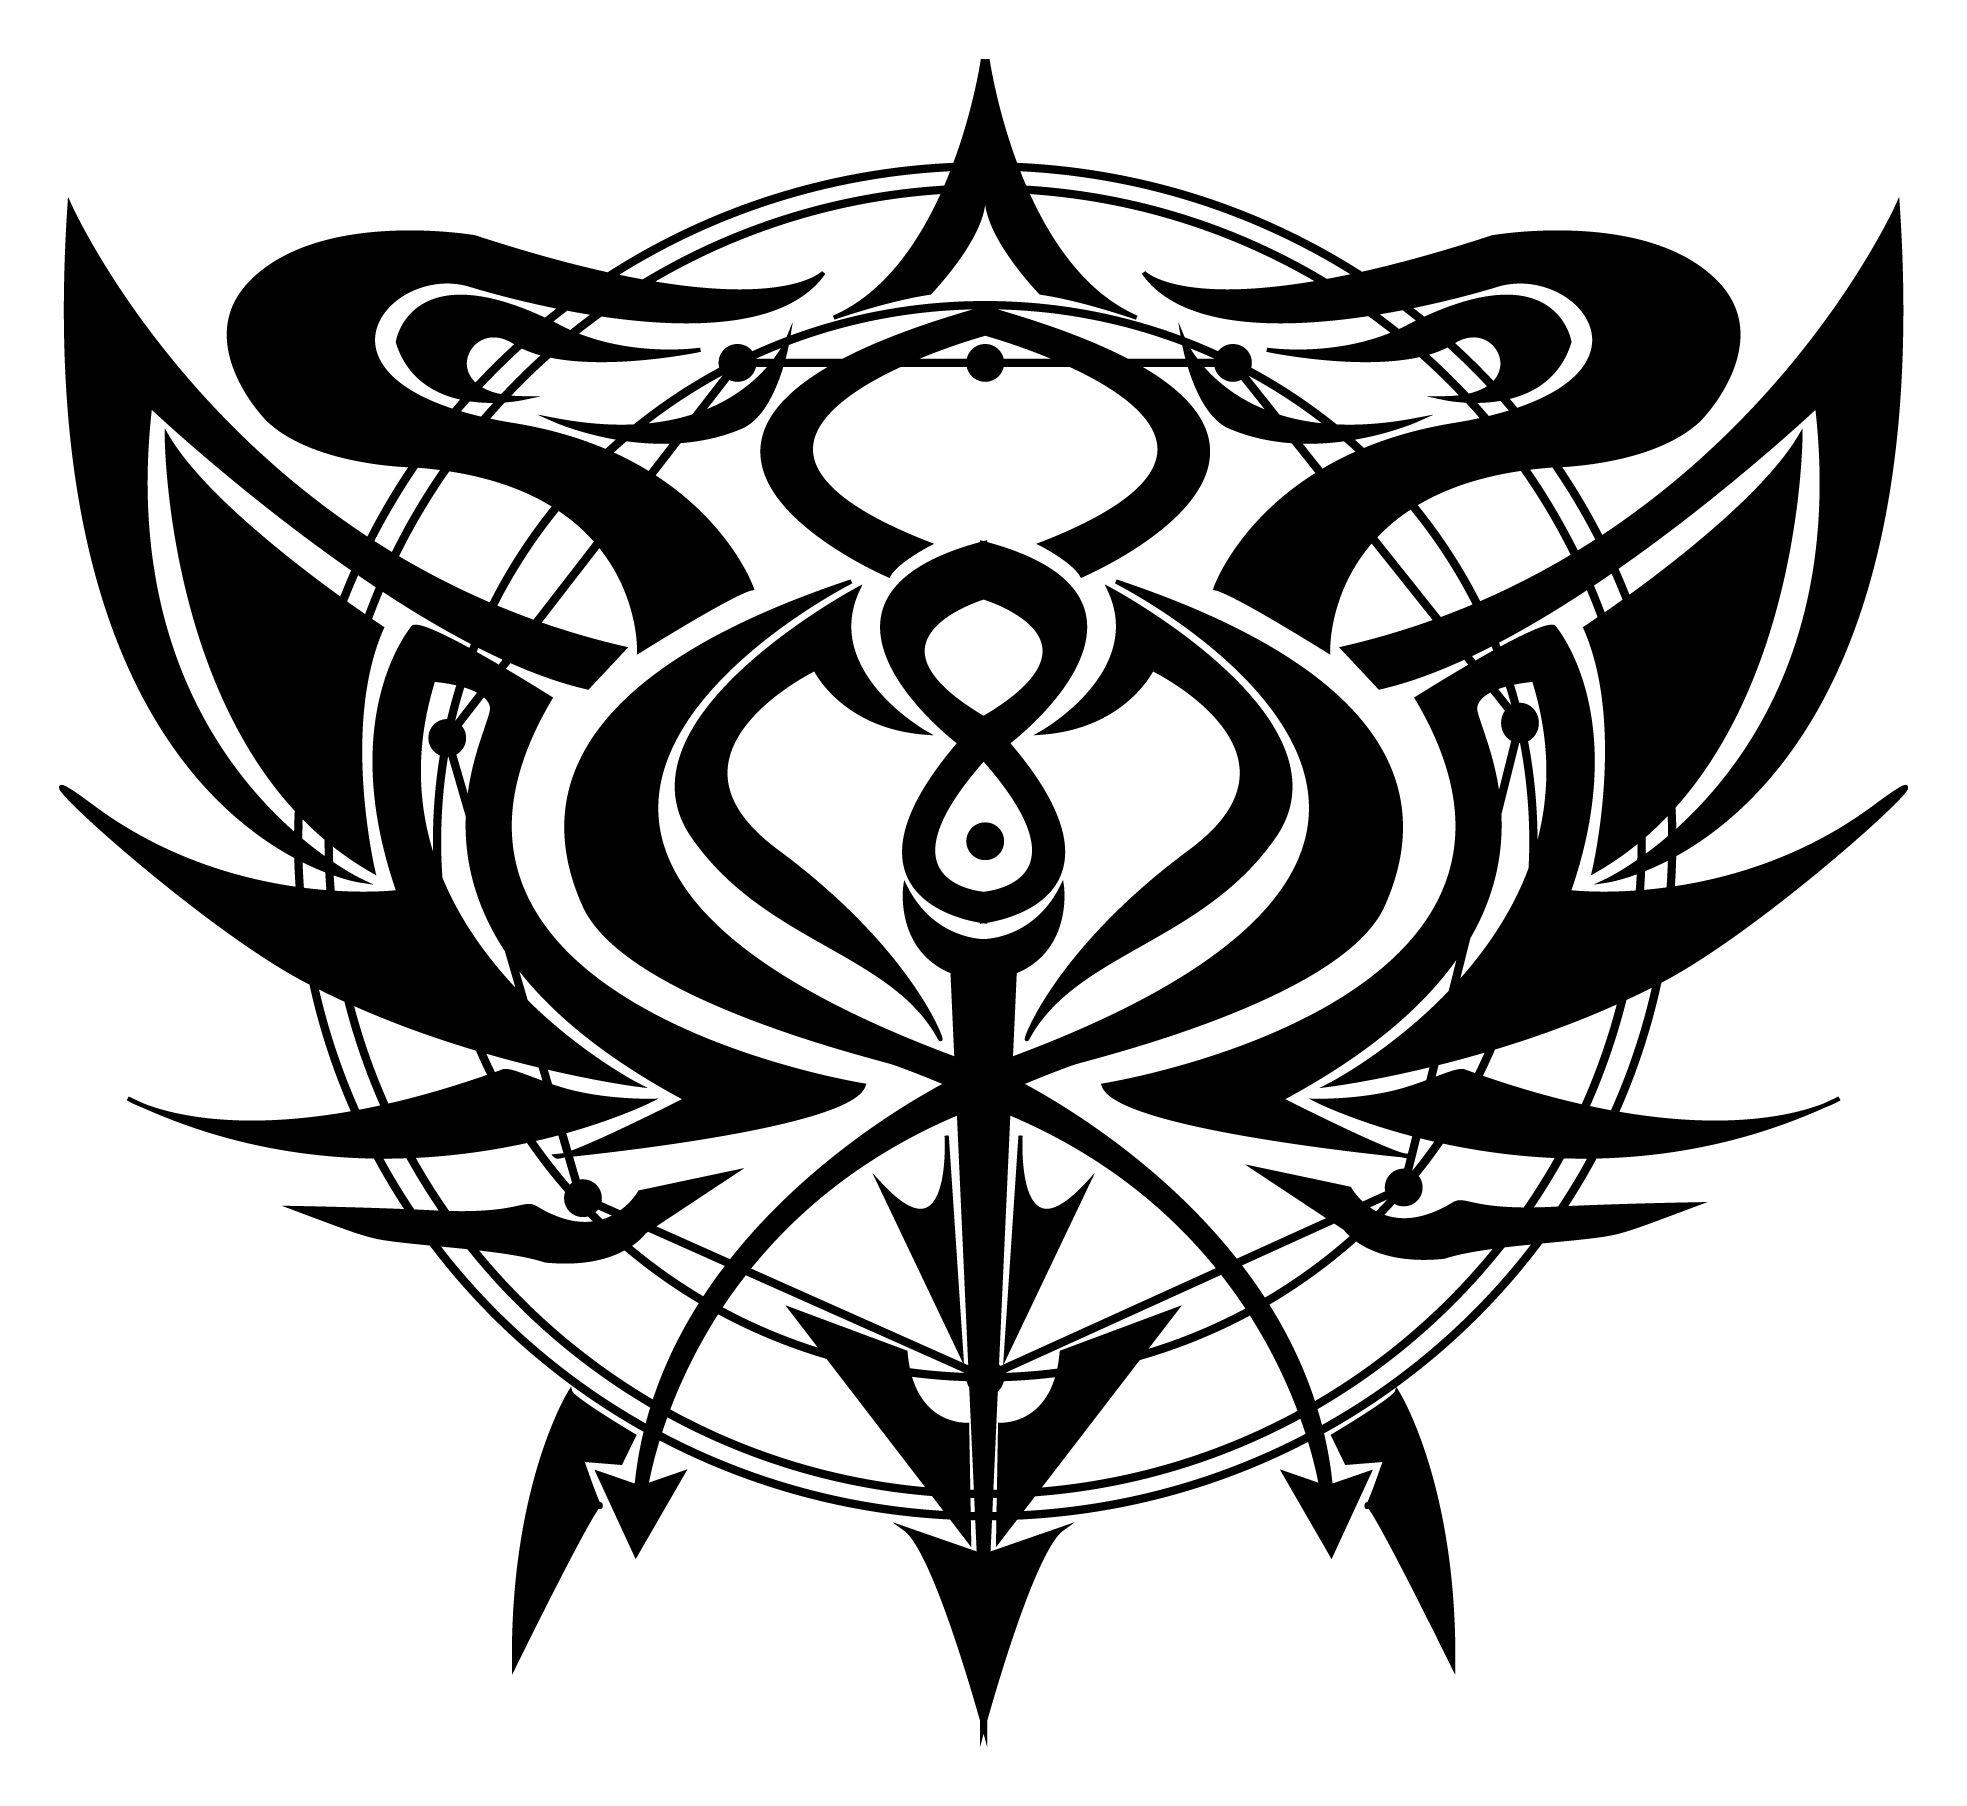 Fullmetal Alchemist Transmutation Circle Pinterest